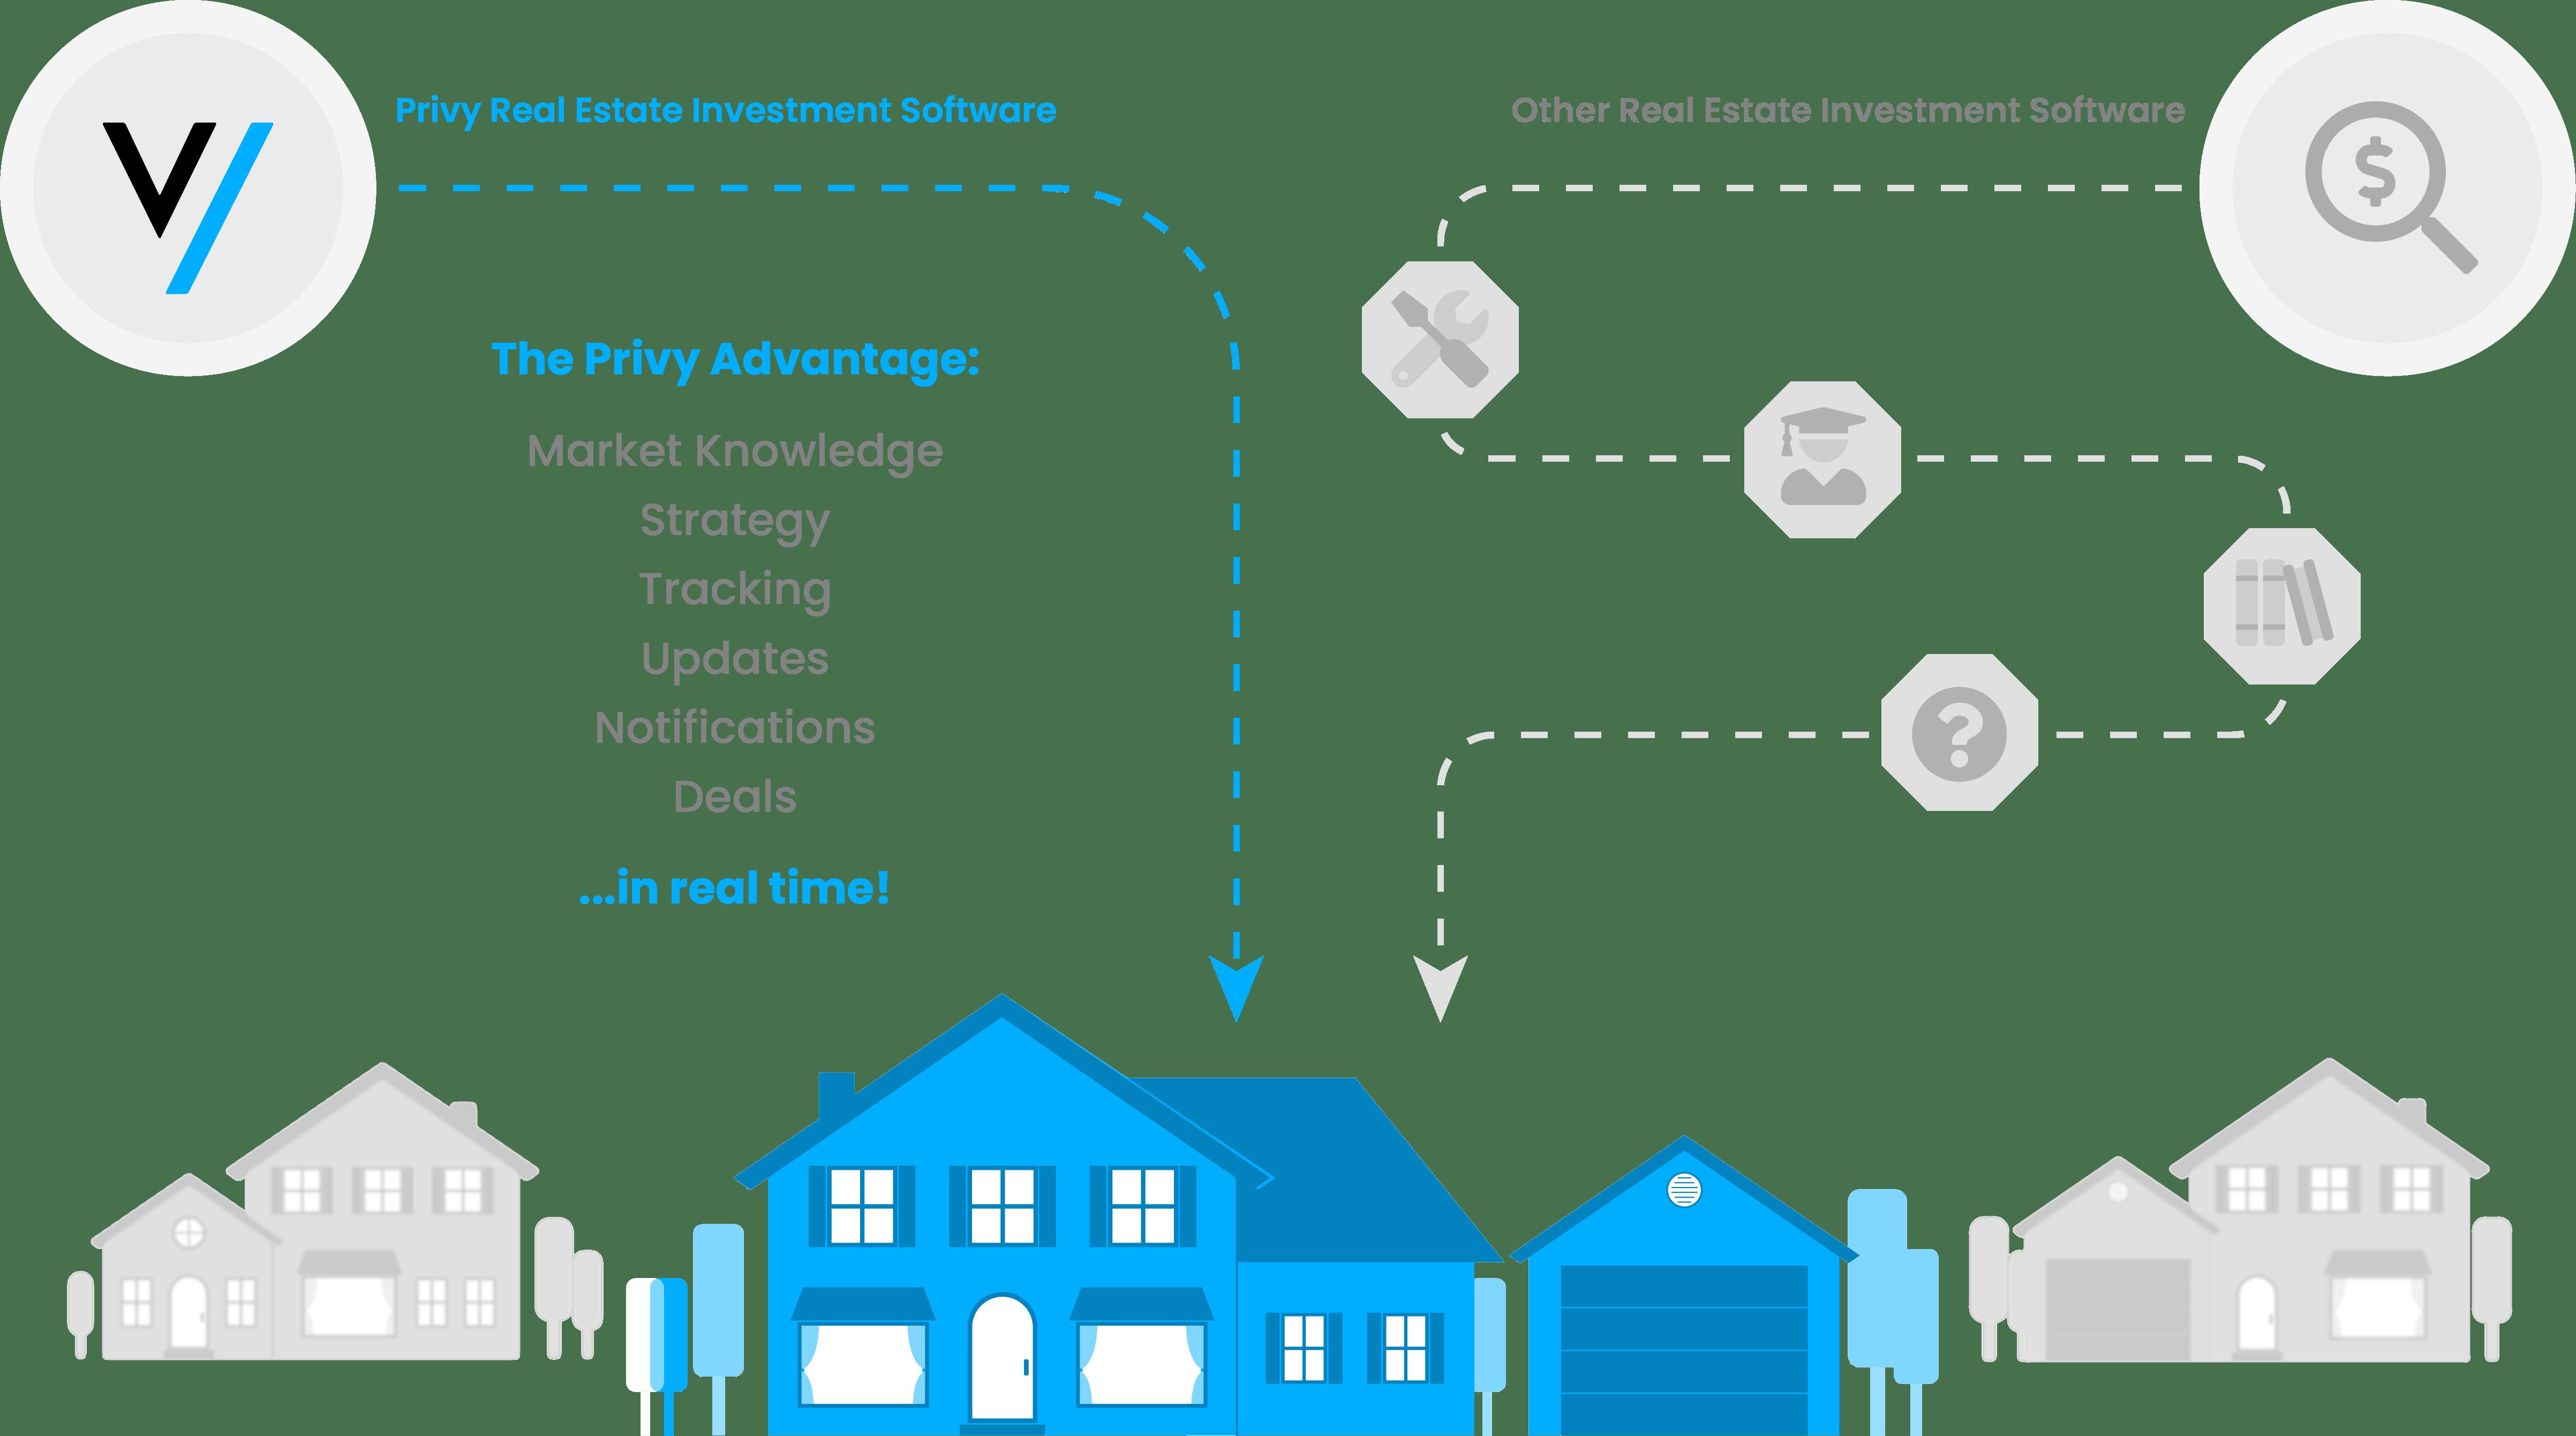 Privy Real Estate Investment Software